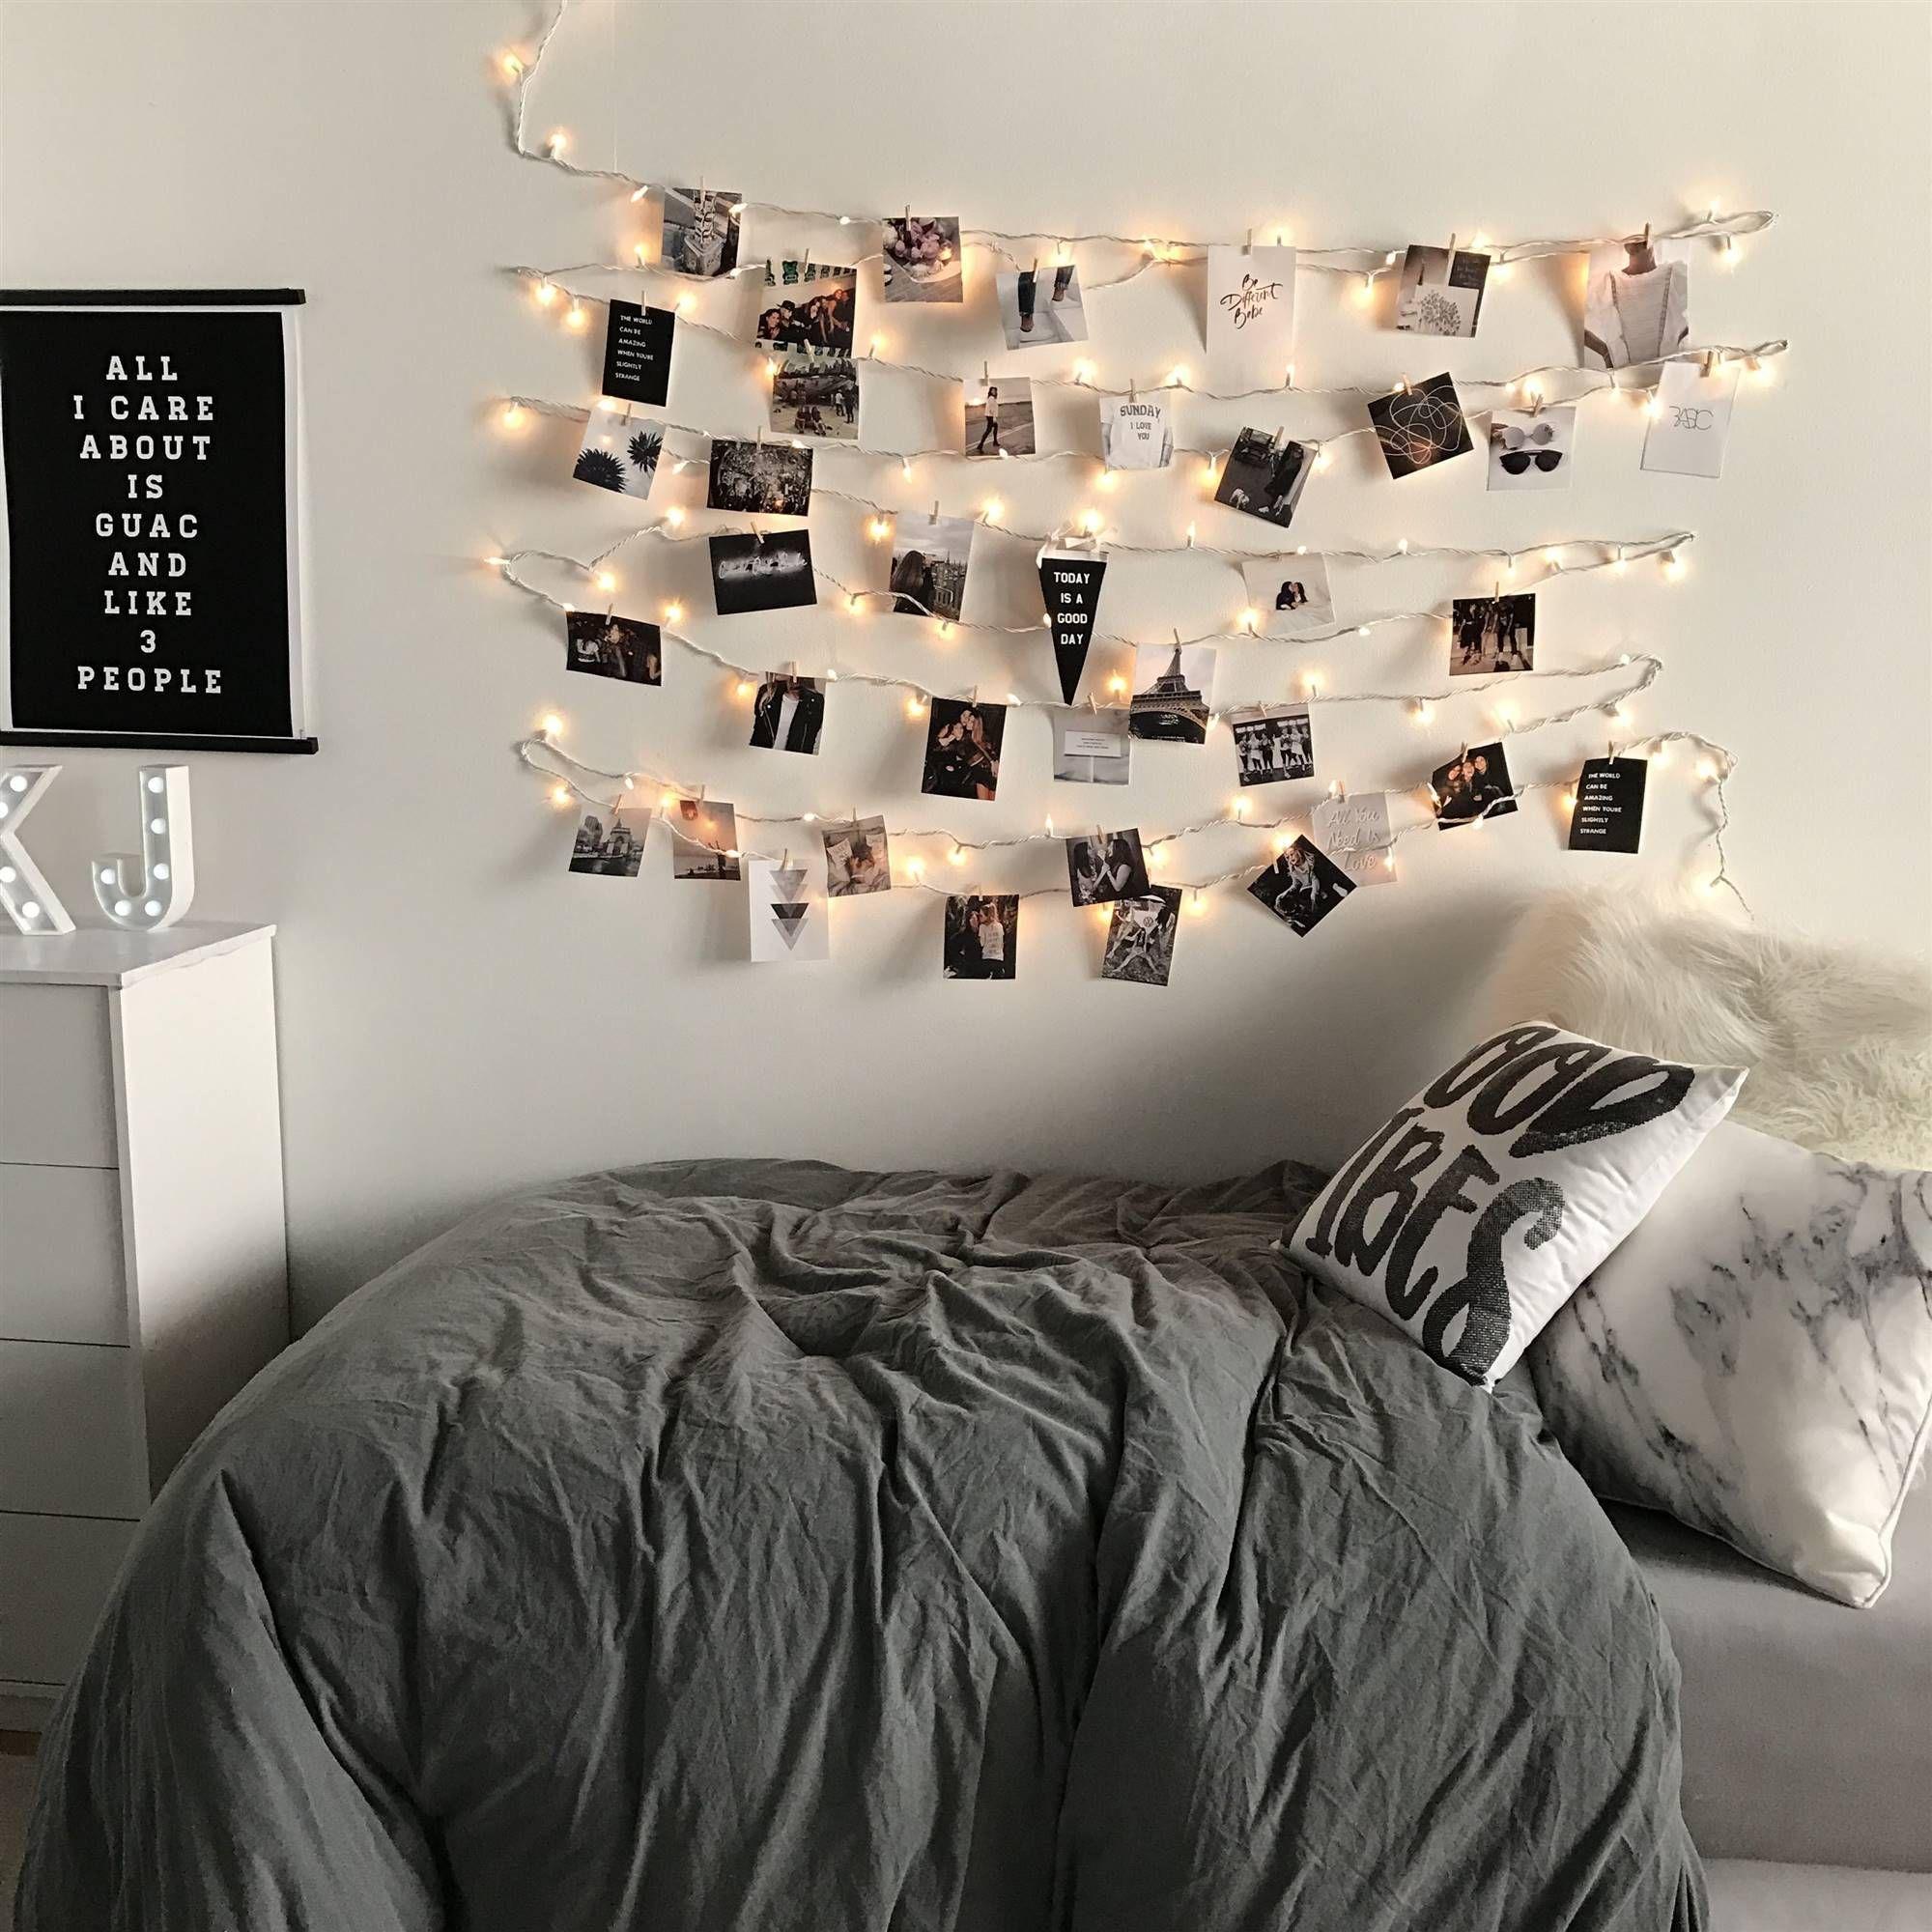 Ilumina tus recuerdos